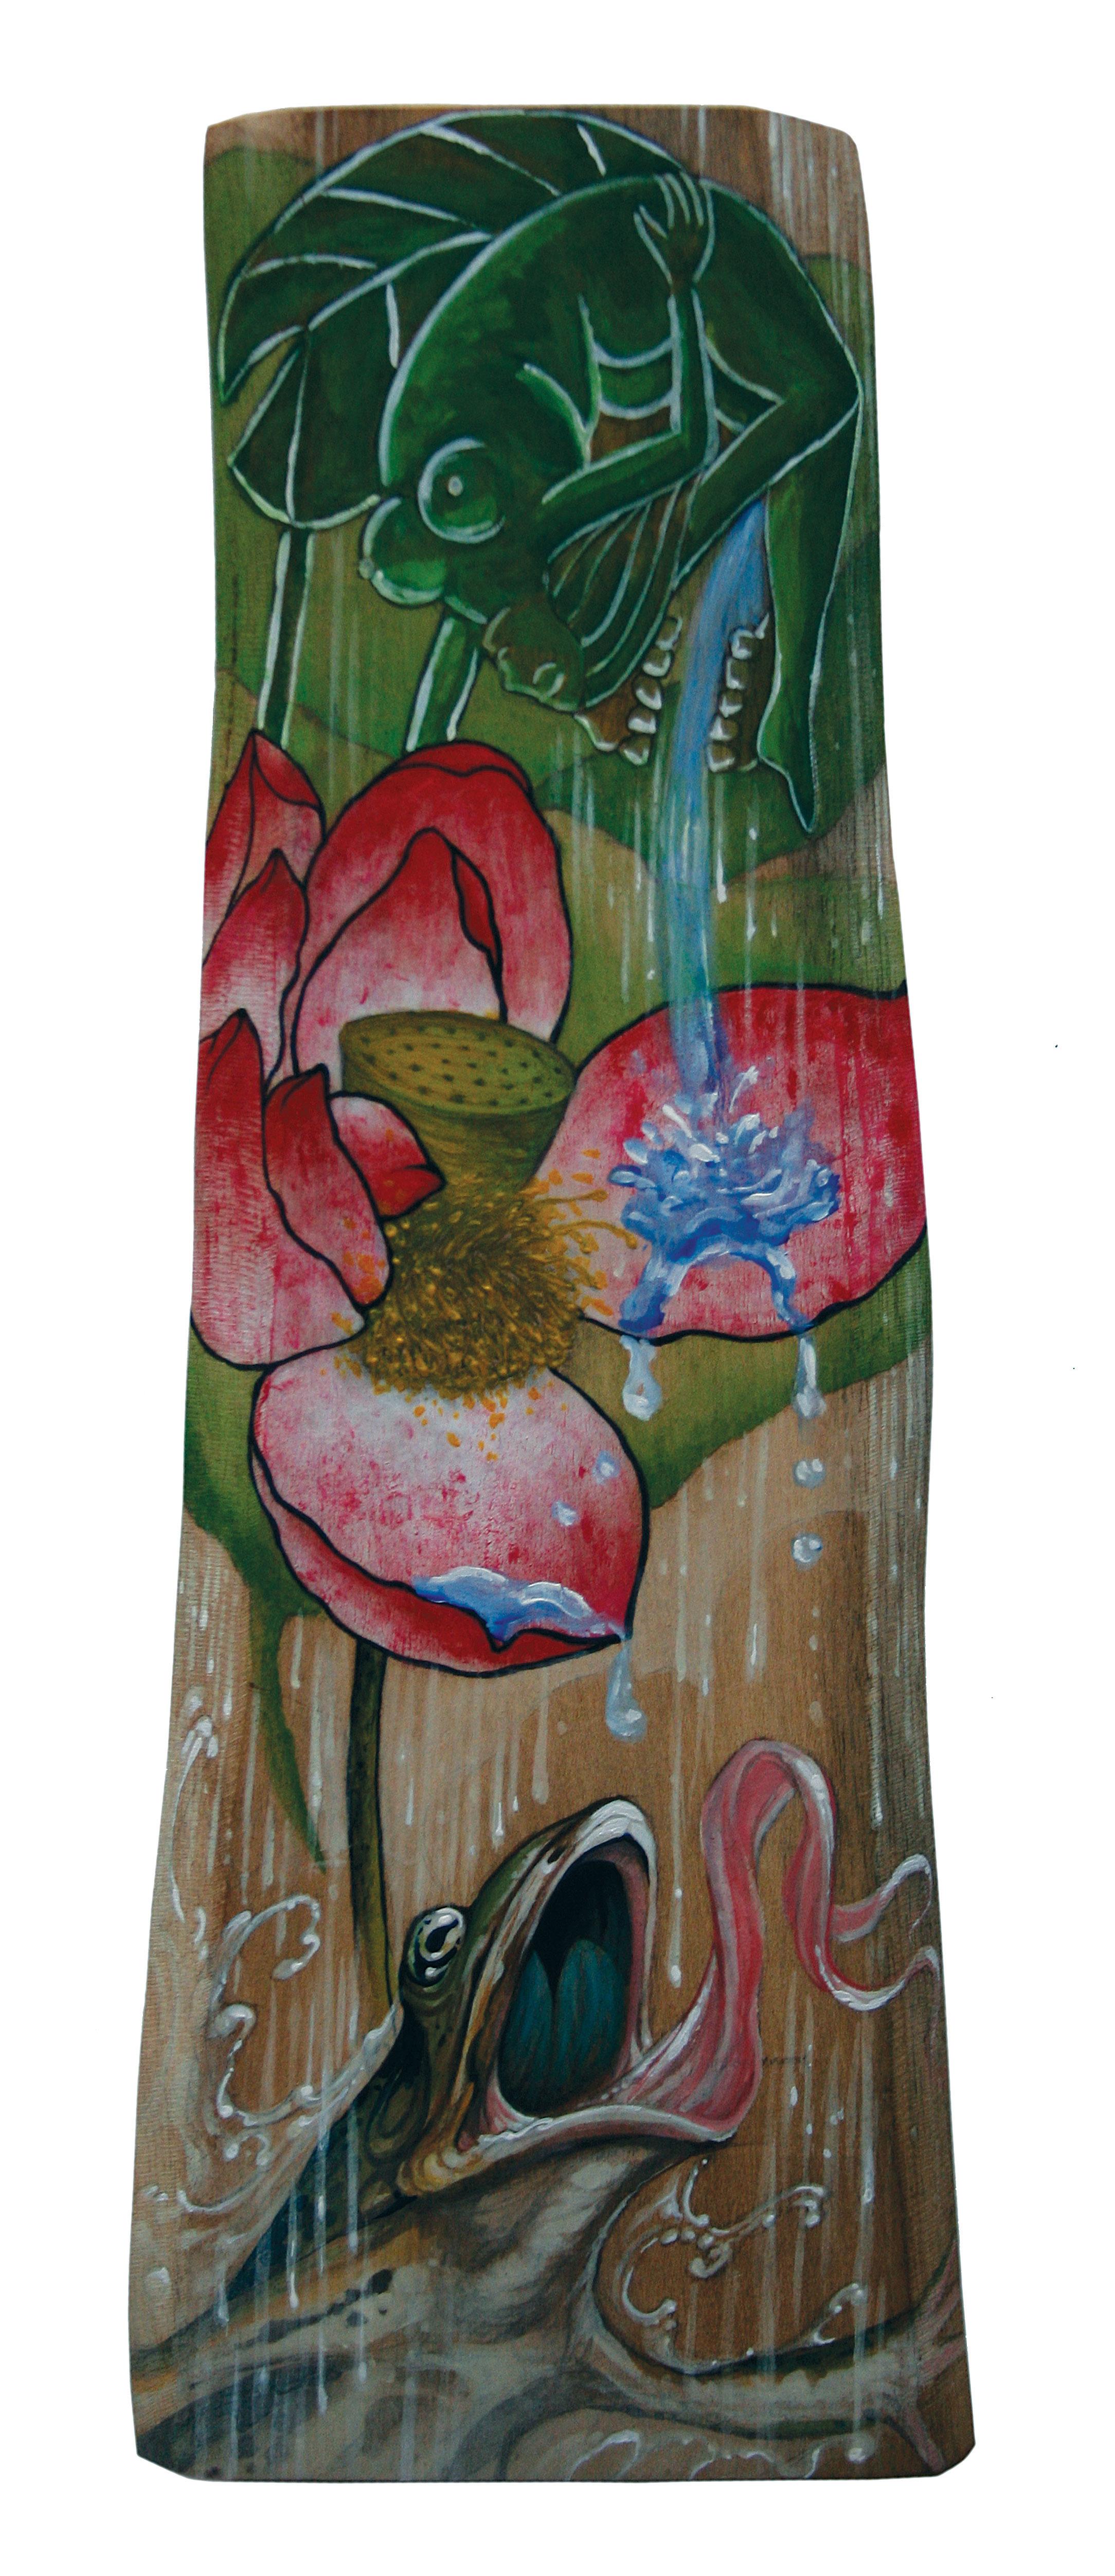 "Christopher Brand, Horiken & Horitaka. Untitled (collaboration). 2010 - acrylic on wood. 12"" x 5""."